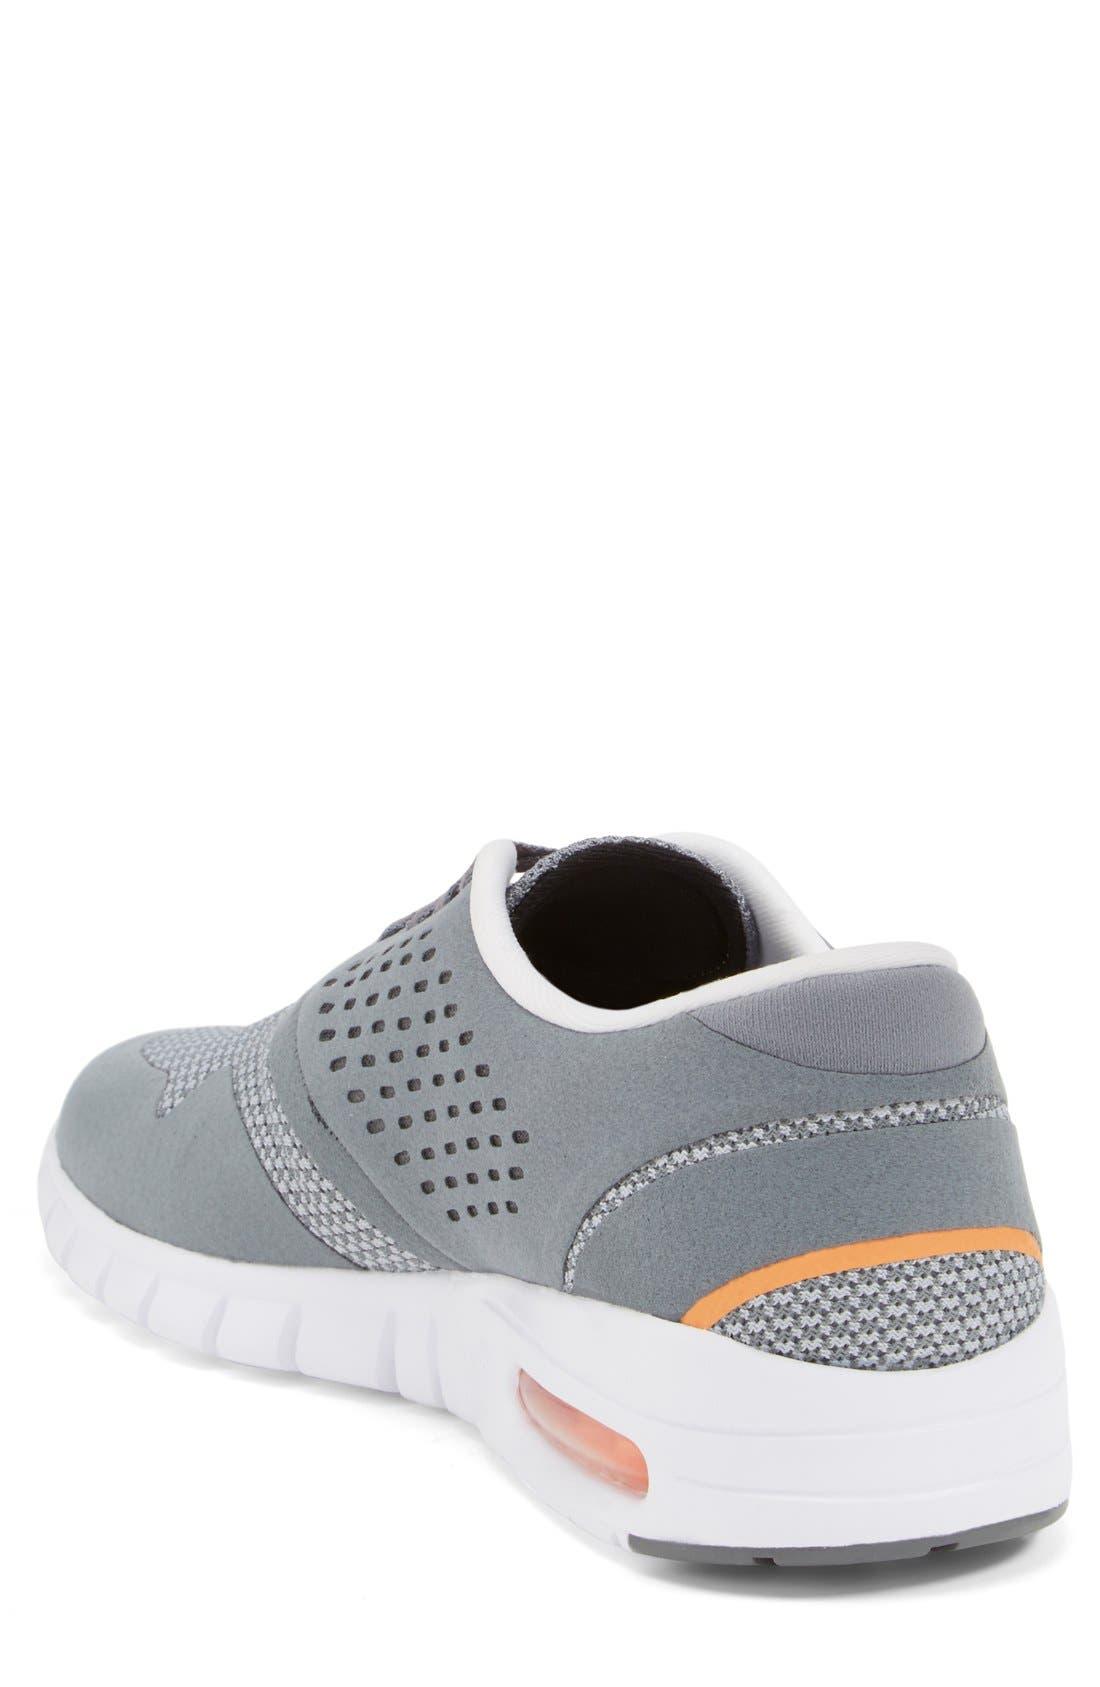 'Eric Koston 2 Max' Skate Sneaker,                             Alternate thumbnail 3, color,                             088